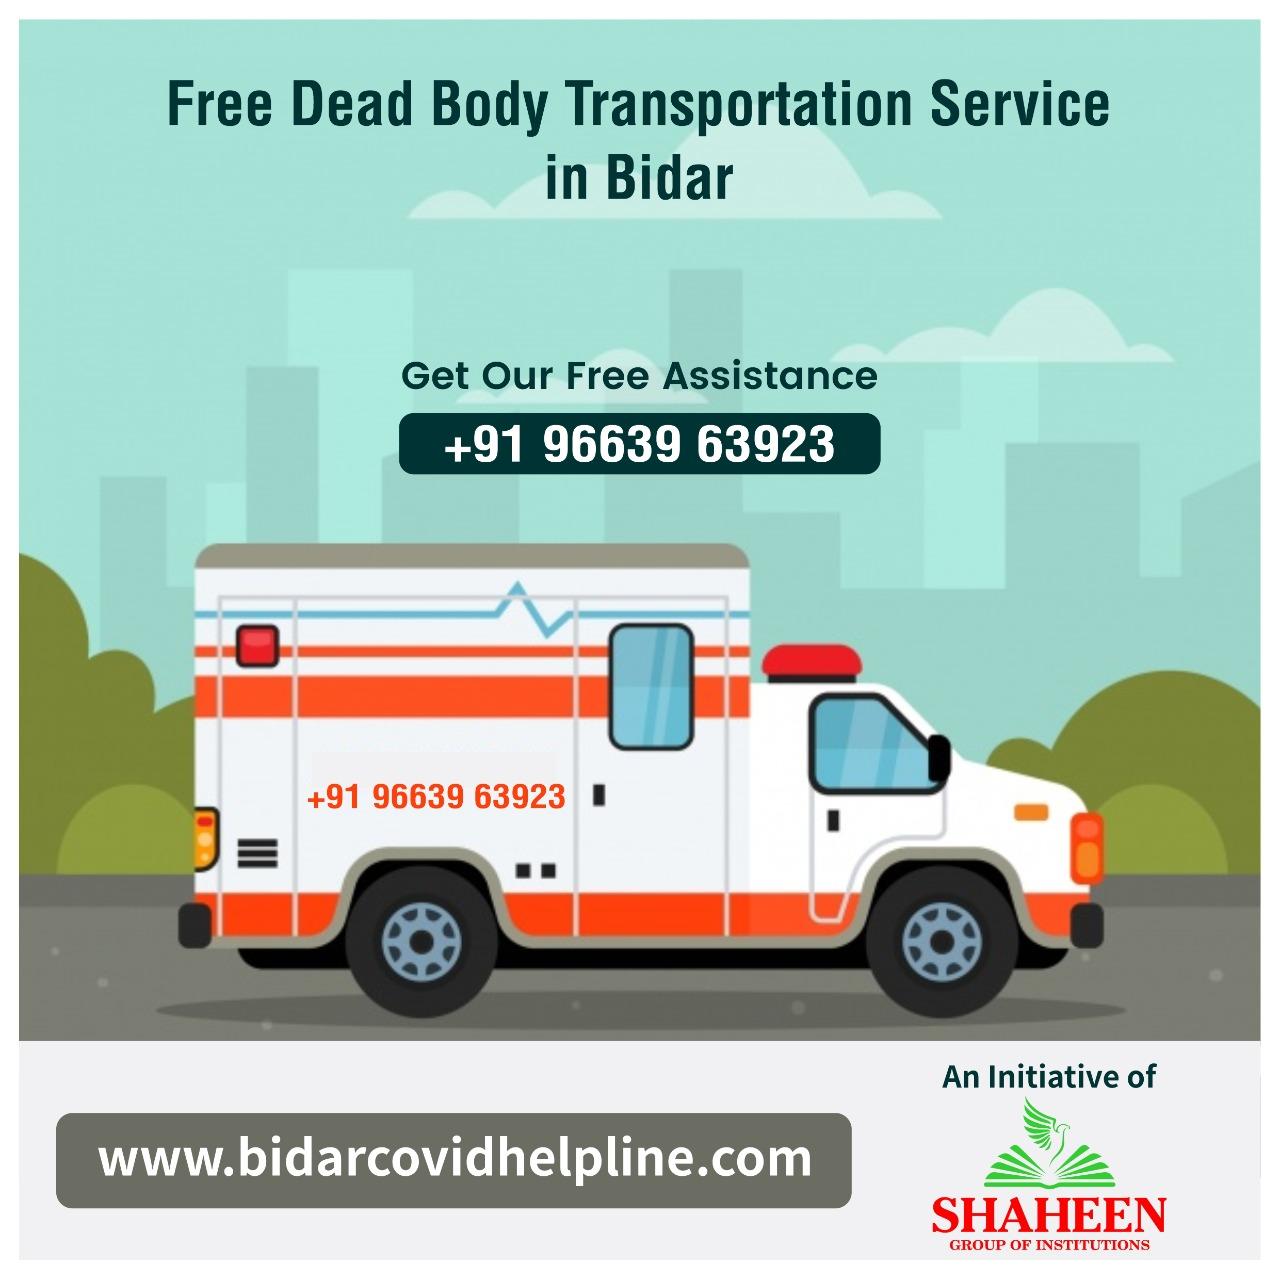 Free Dead Body Transportation Service